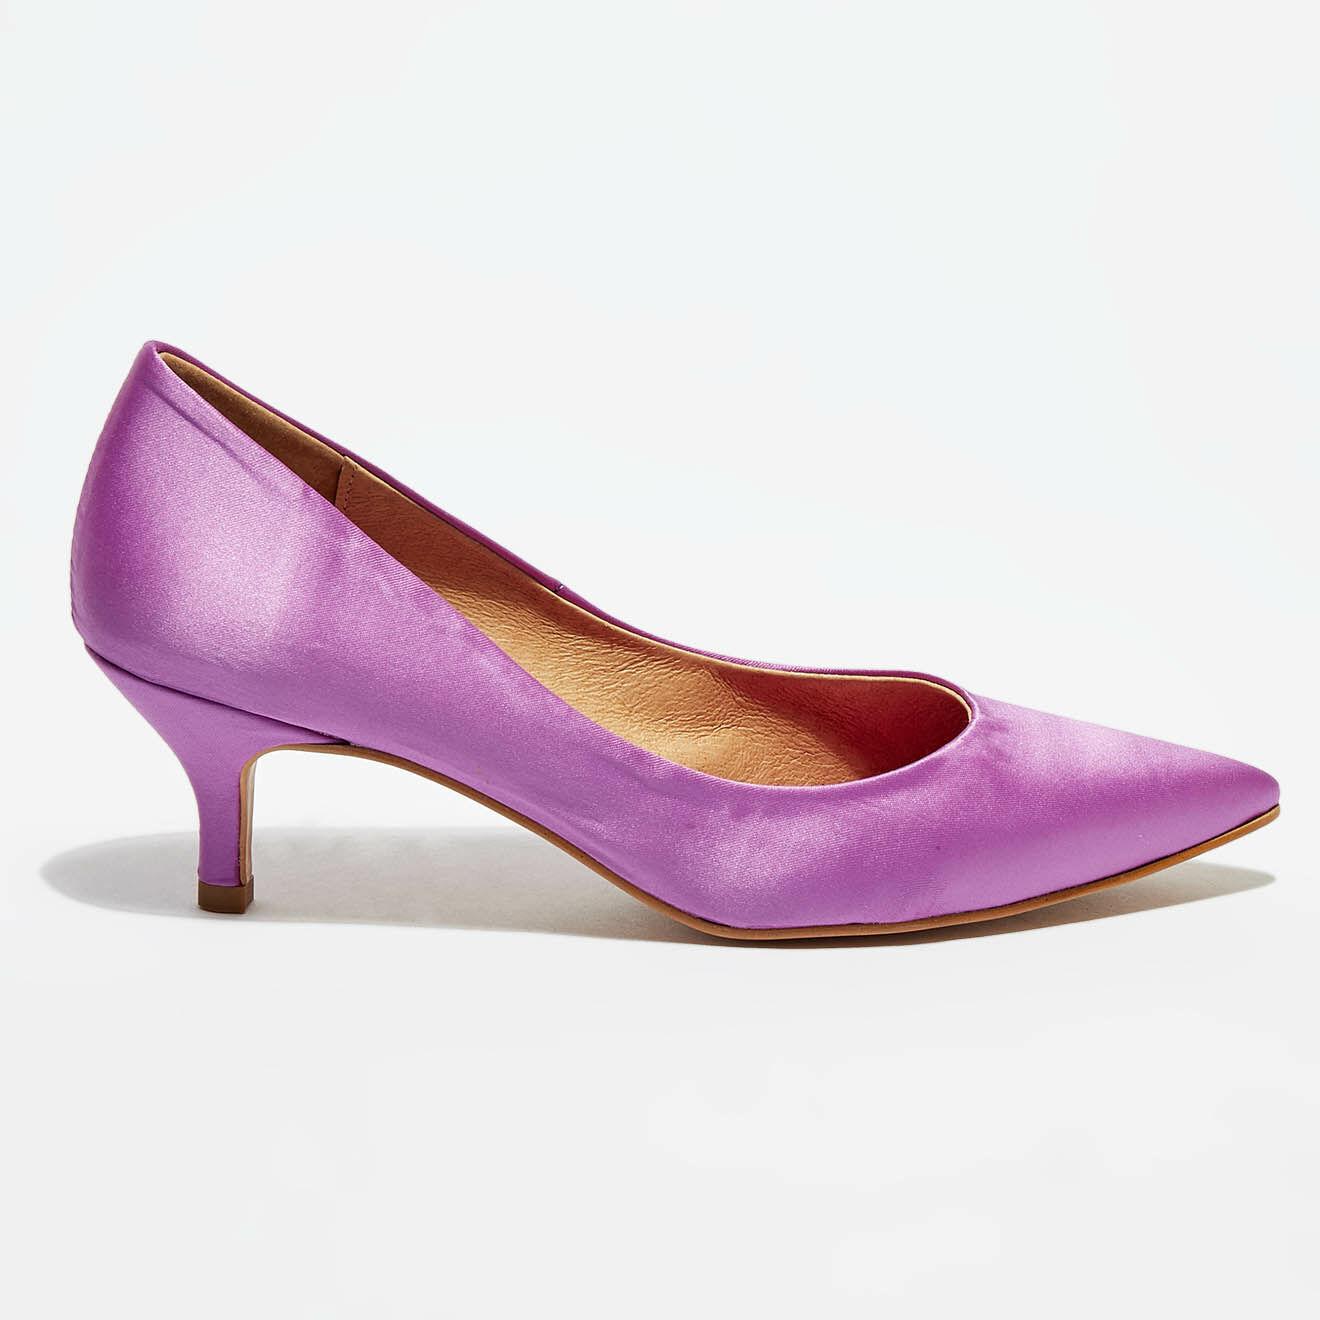 Escarpins en Tissu satiné Shika violets - Talon 5 cm - Flavio Création - Modalova